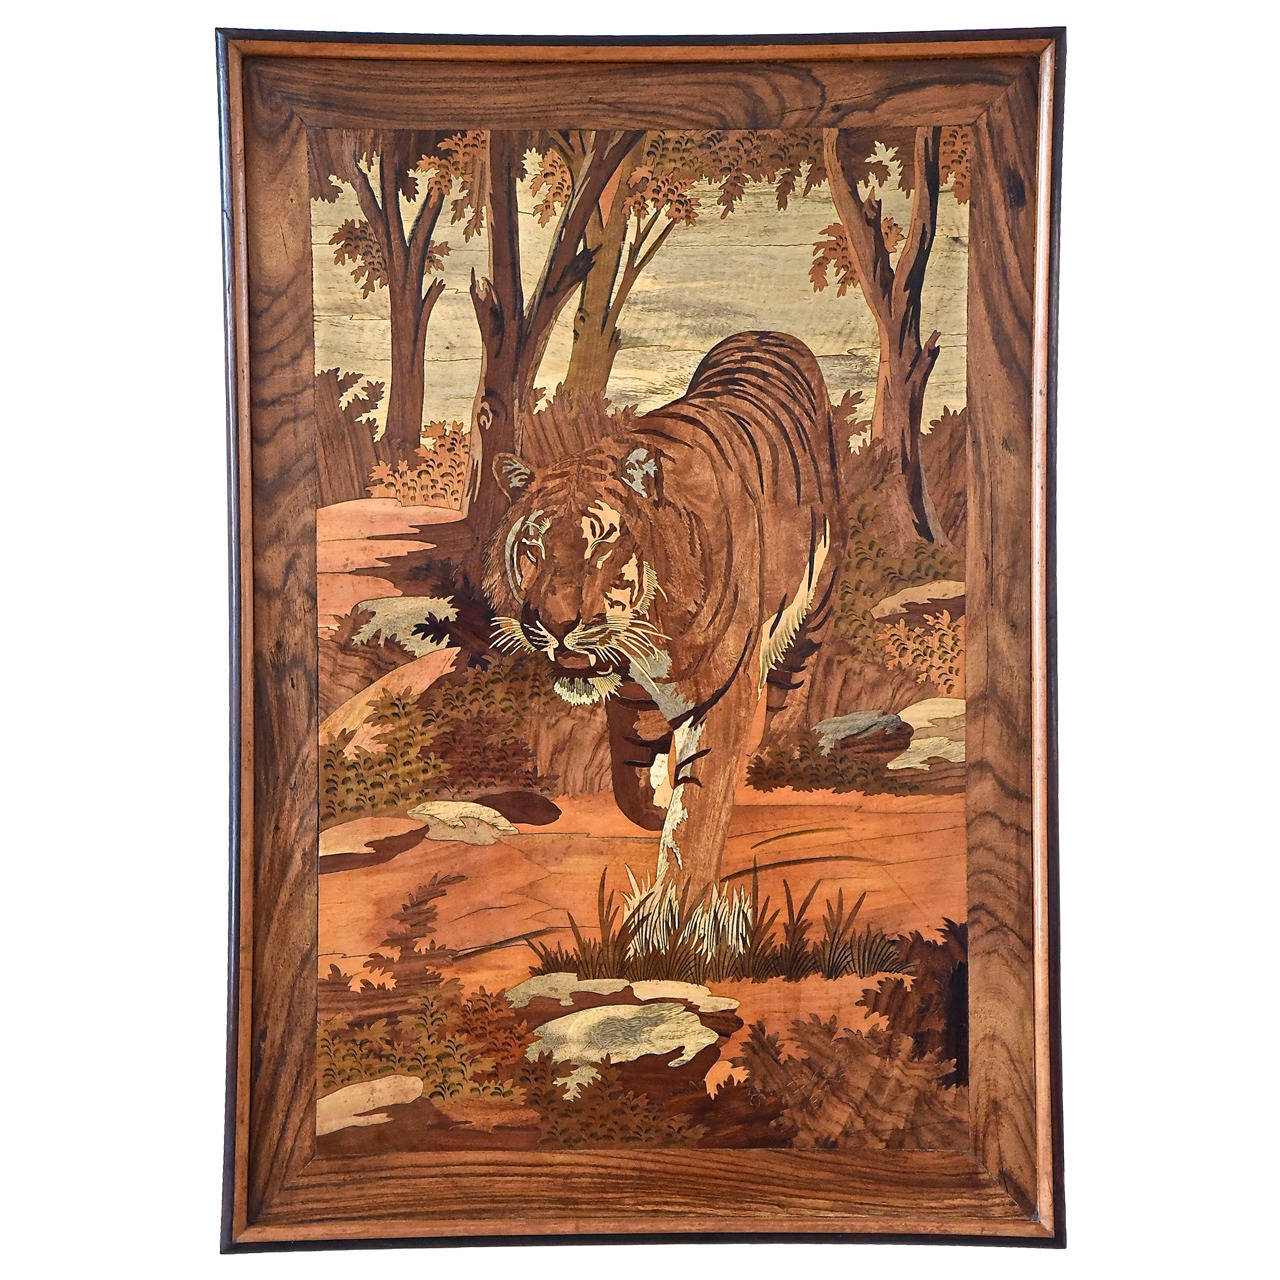 Art Deco Wall Panels: Art Deco Wood Inlay Panel With Tiger, France, 1930 At 1stdibs